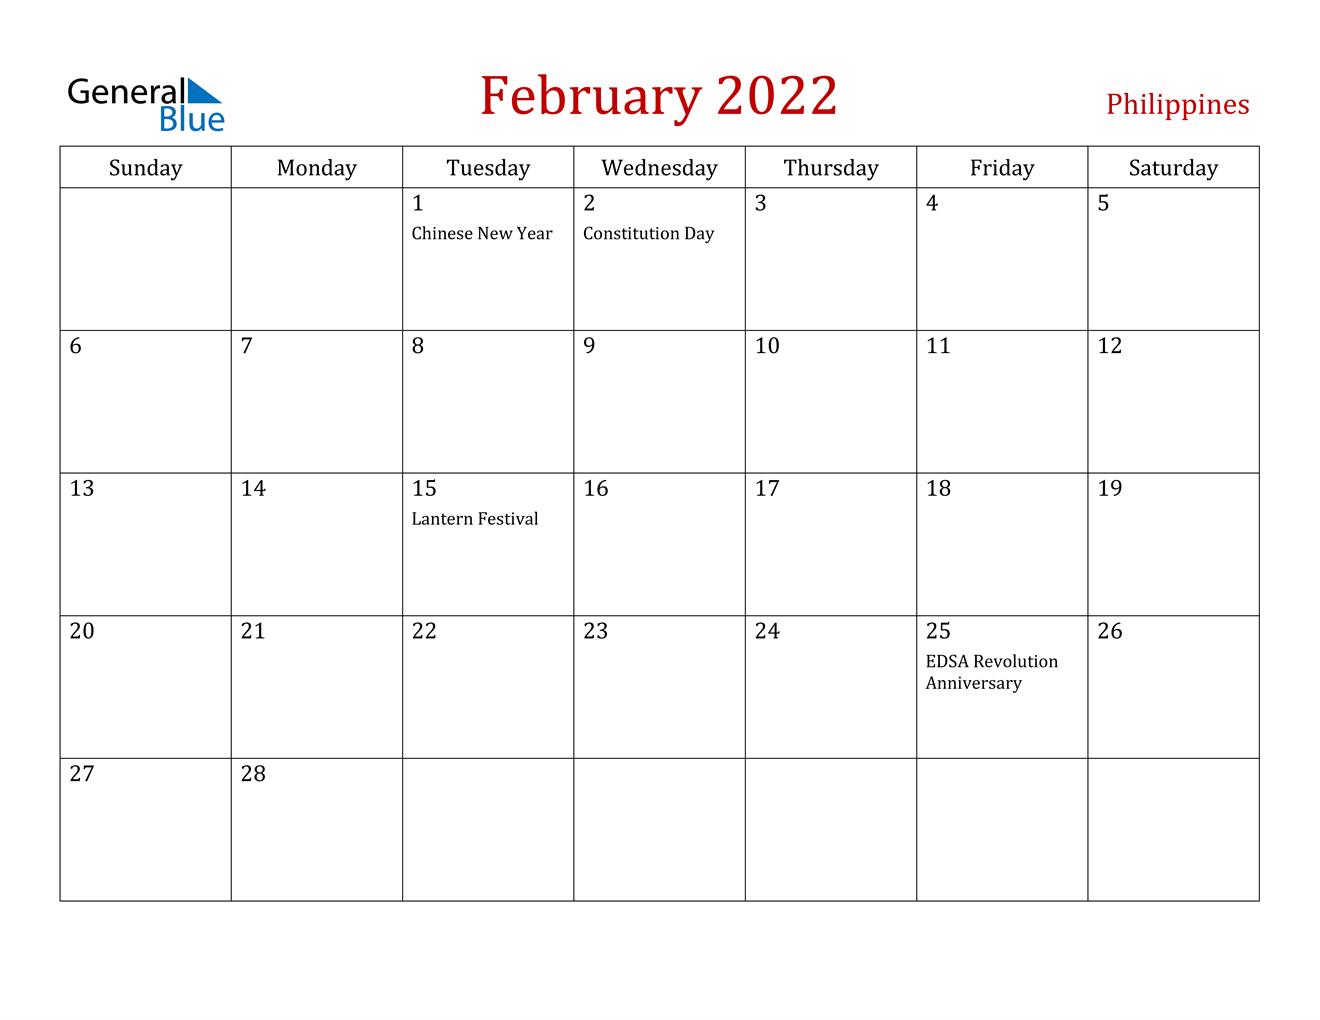 February 2022 Calendar - Philippines Throughout Fillable February 2022 Calendar